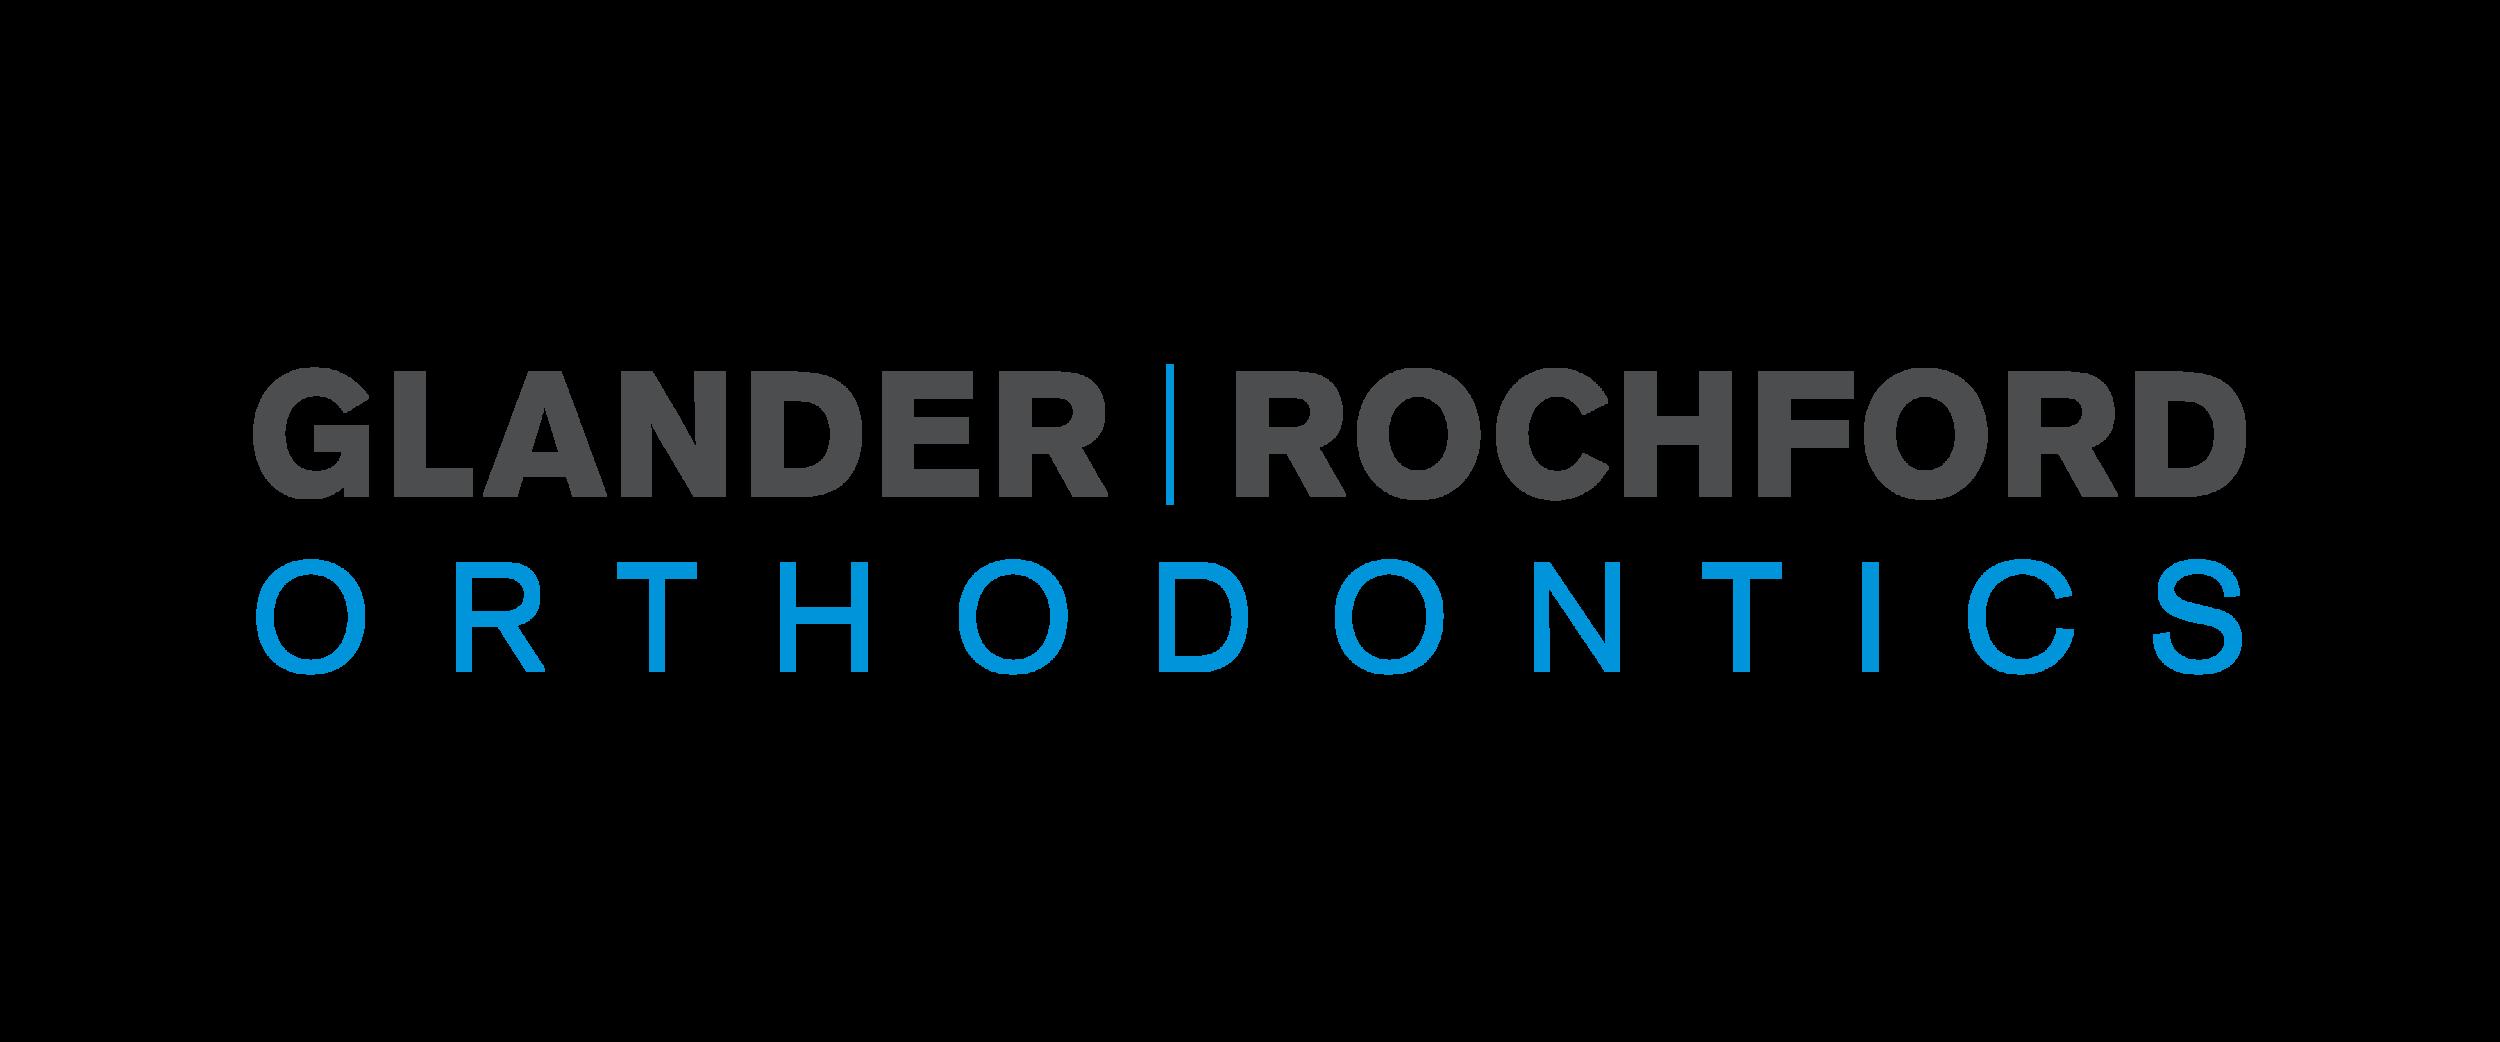 GLANDER ROCHFORD horizontal.png